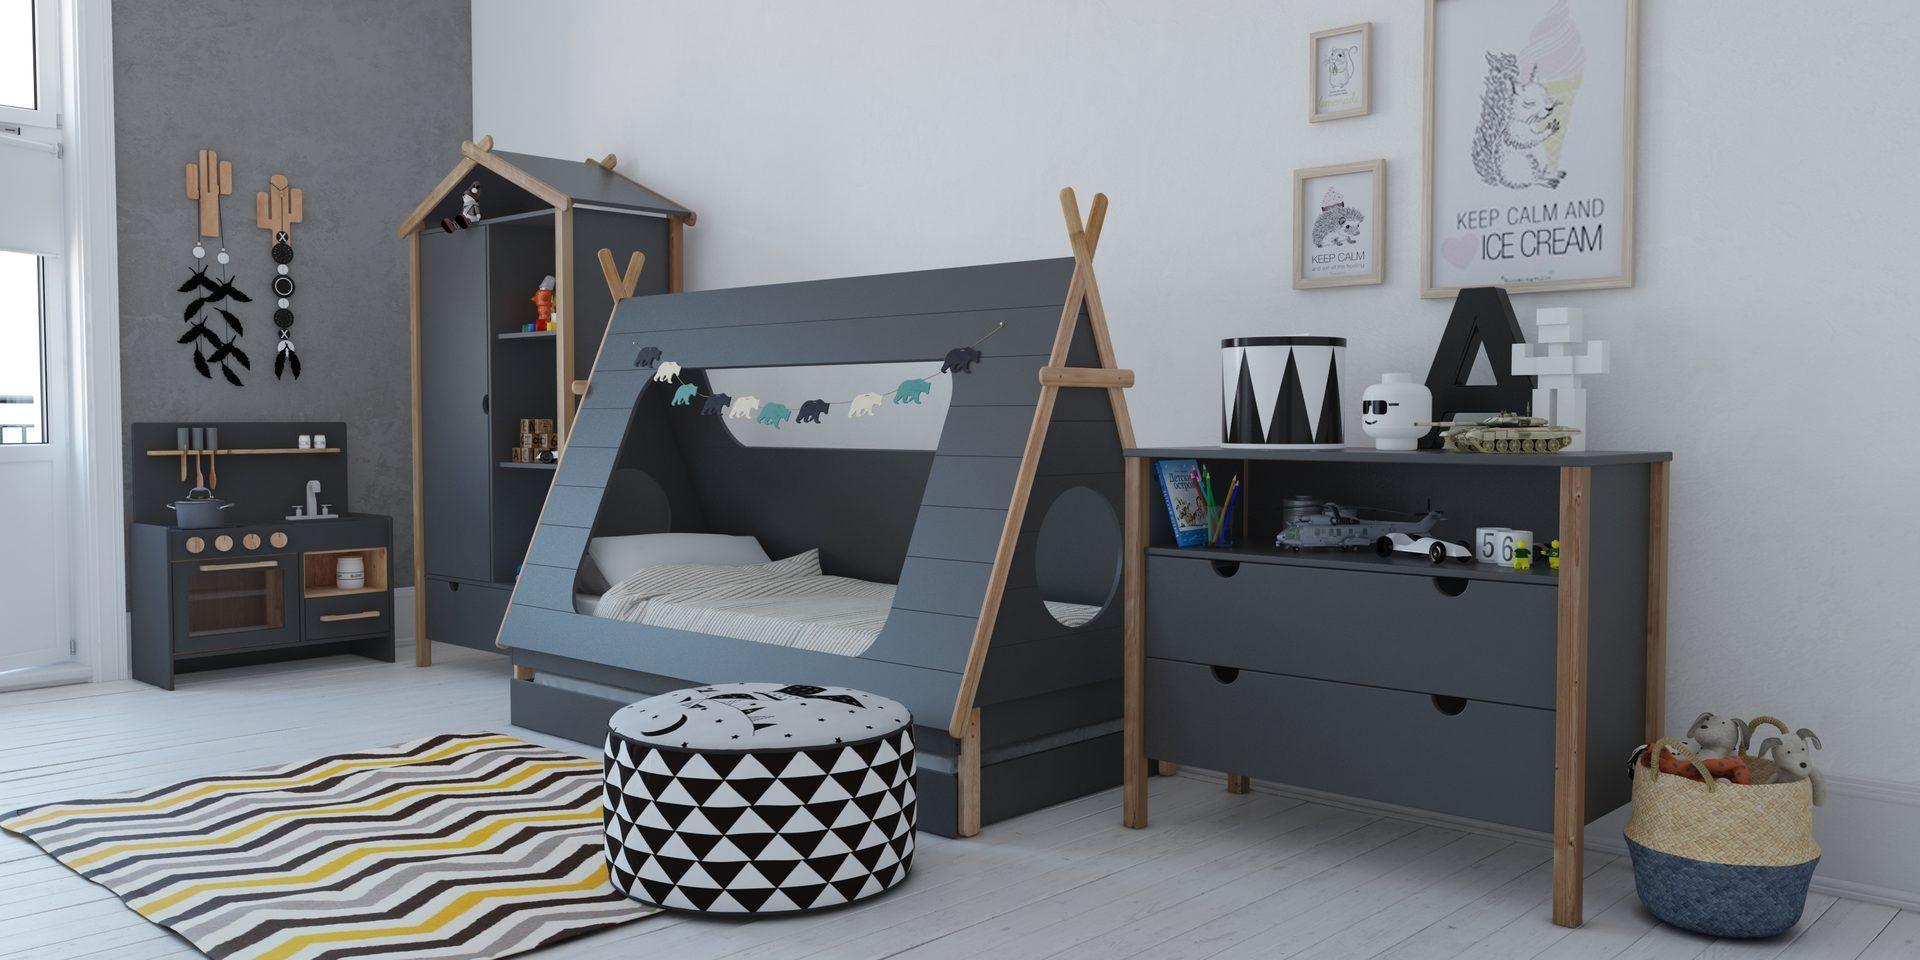 Bln Kids Tipi Bett 90x200cm grau/natur in 2020 Tipi bett